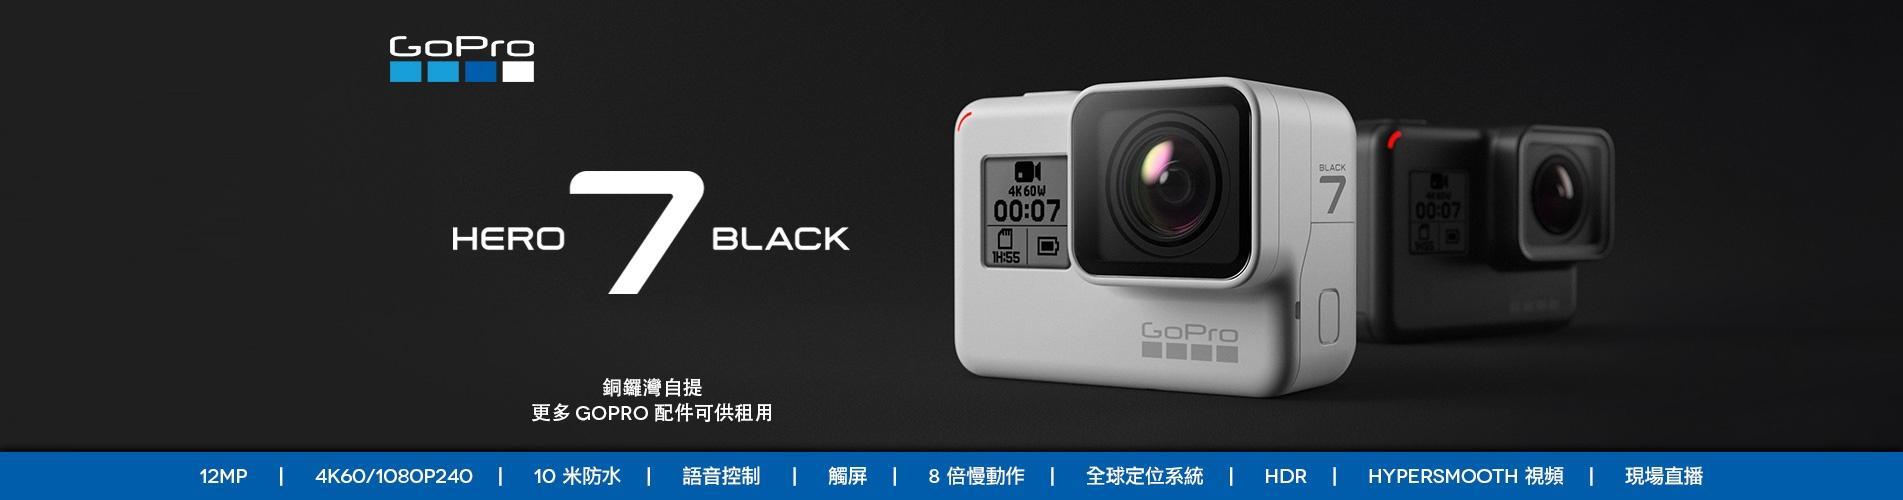 GoPro HERO7 Black 運動攝影機 (租借)